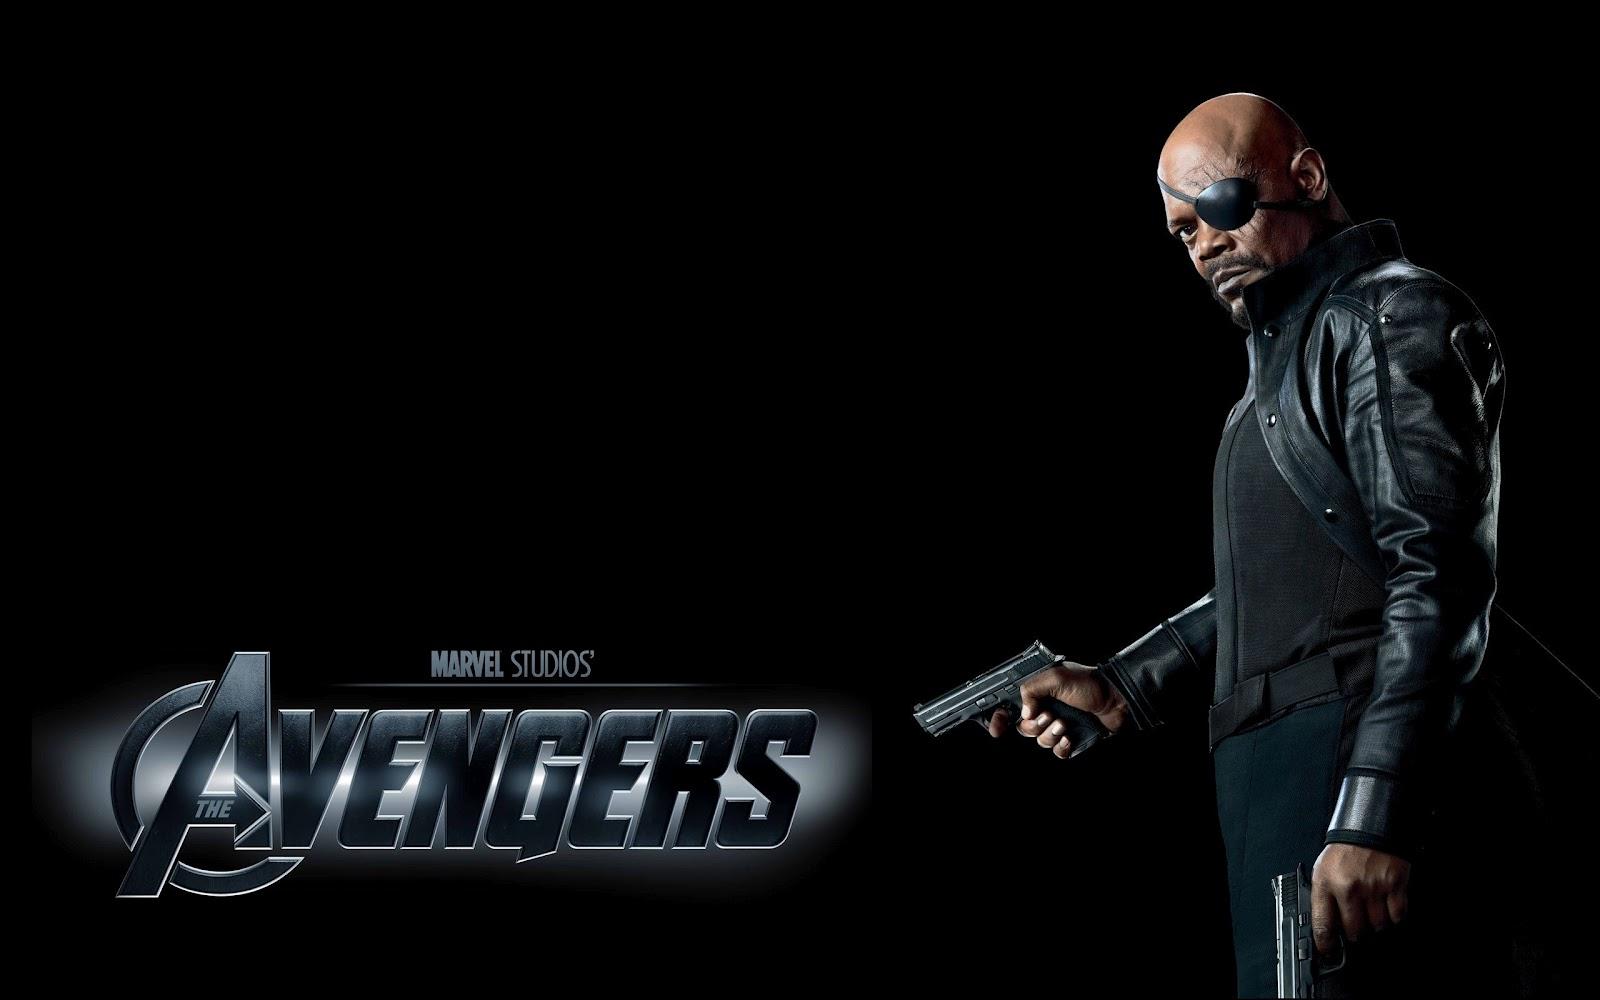 http://1.bp.blogspot.com/-8jI3ay3Aarw/T29fUIXVI2I/AAAAAAAAA_s/Pa7Gd8toAWI/s1600/Avengers_Nic_Fury_Samuel_L_Jackson_HD_Wallpaper-Vvallpaper.Net.jpg